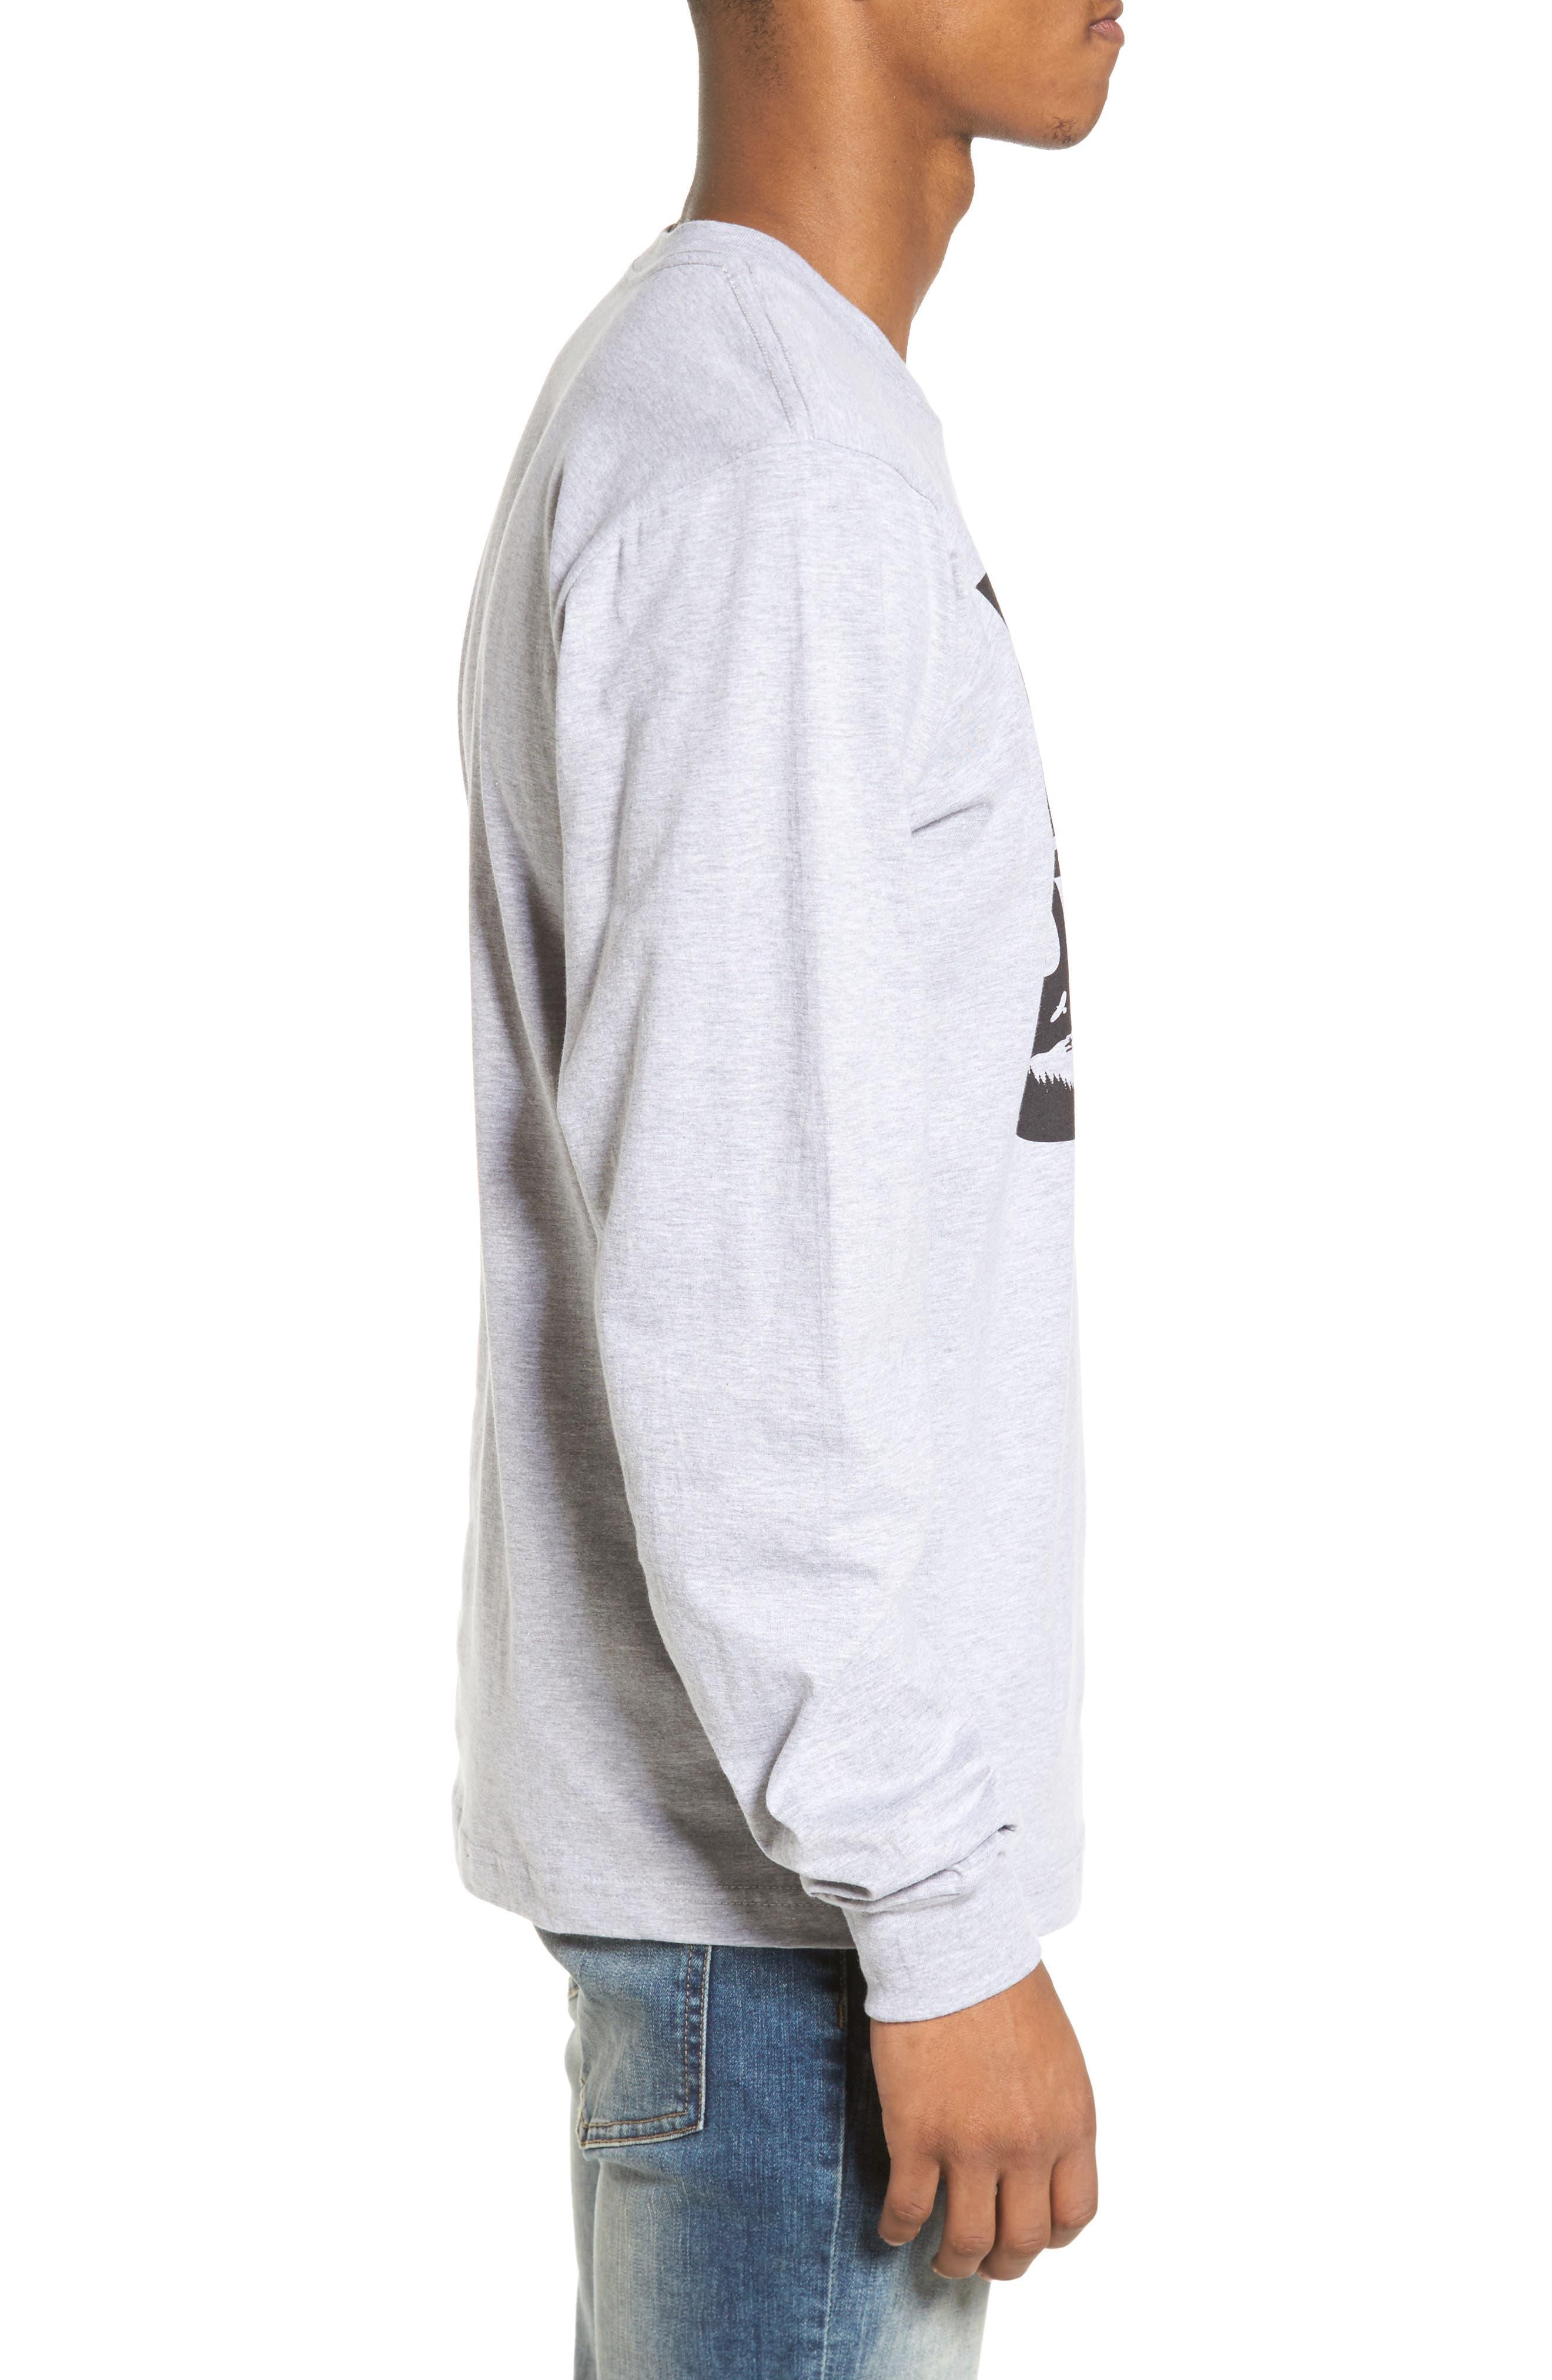 PNW Shield Sweatshirt,                             Alternate thumbnail 3, color,                             020